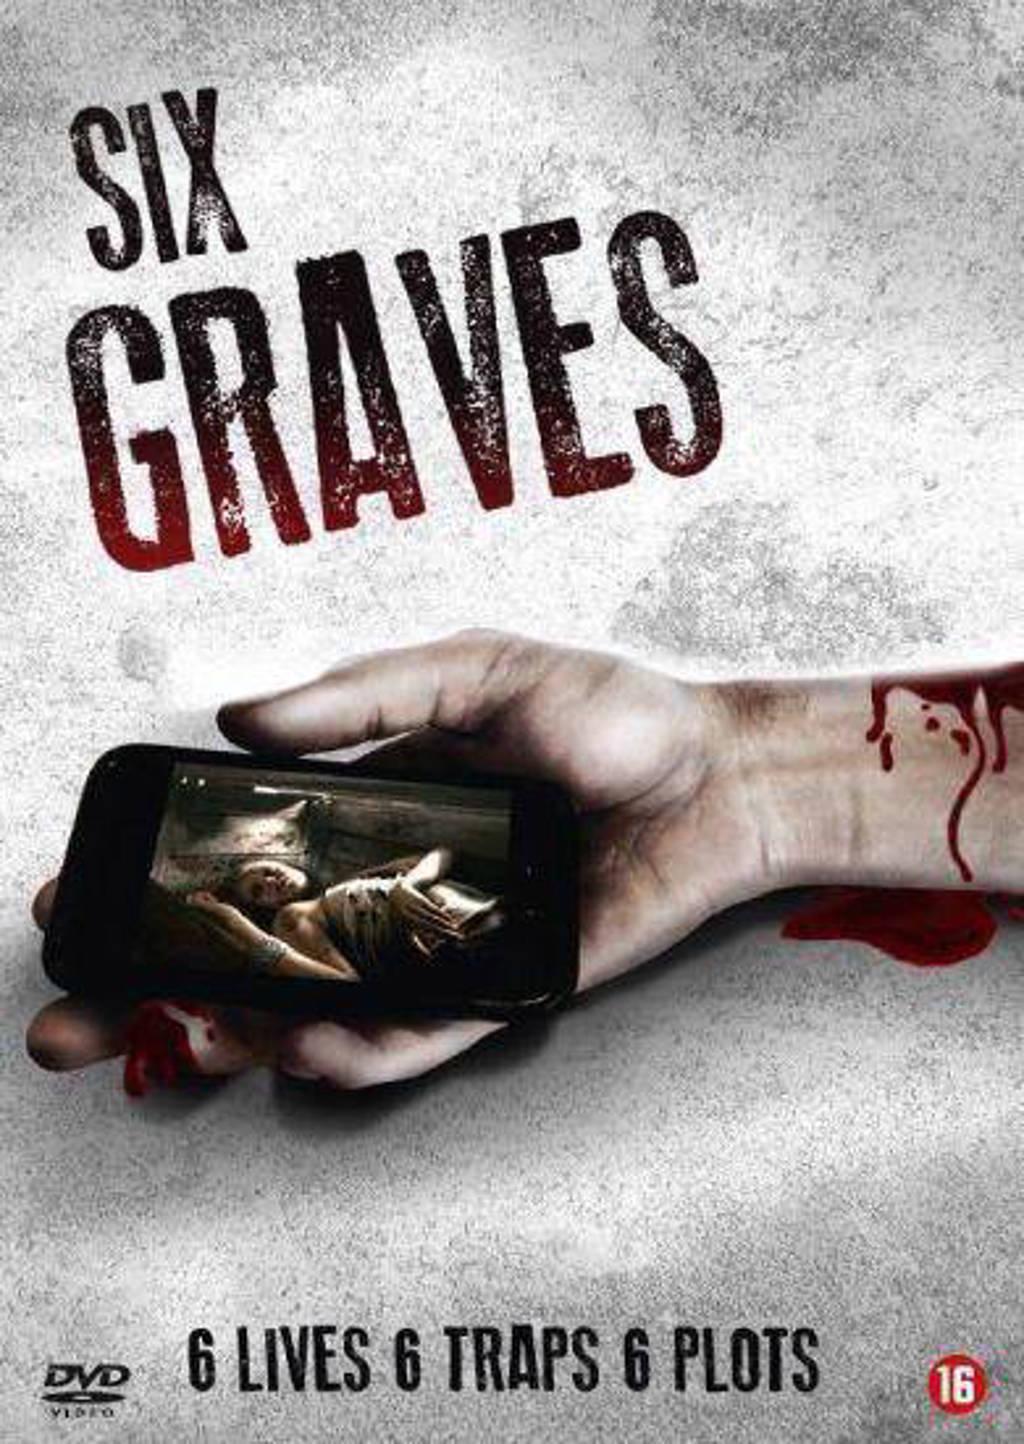 Six graves (DVD)